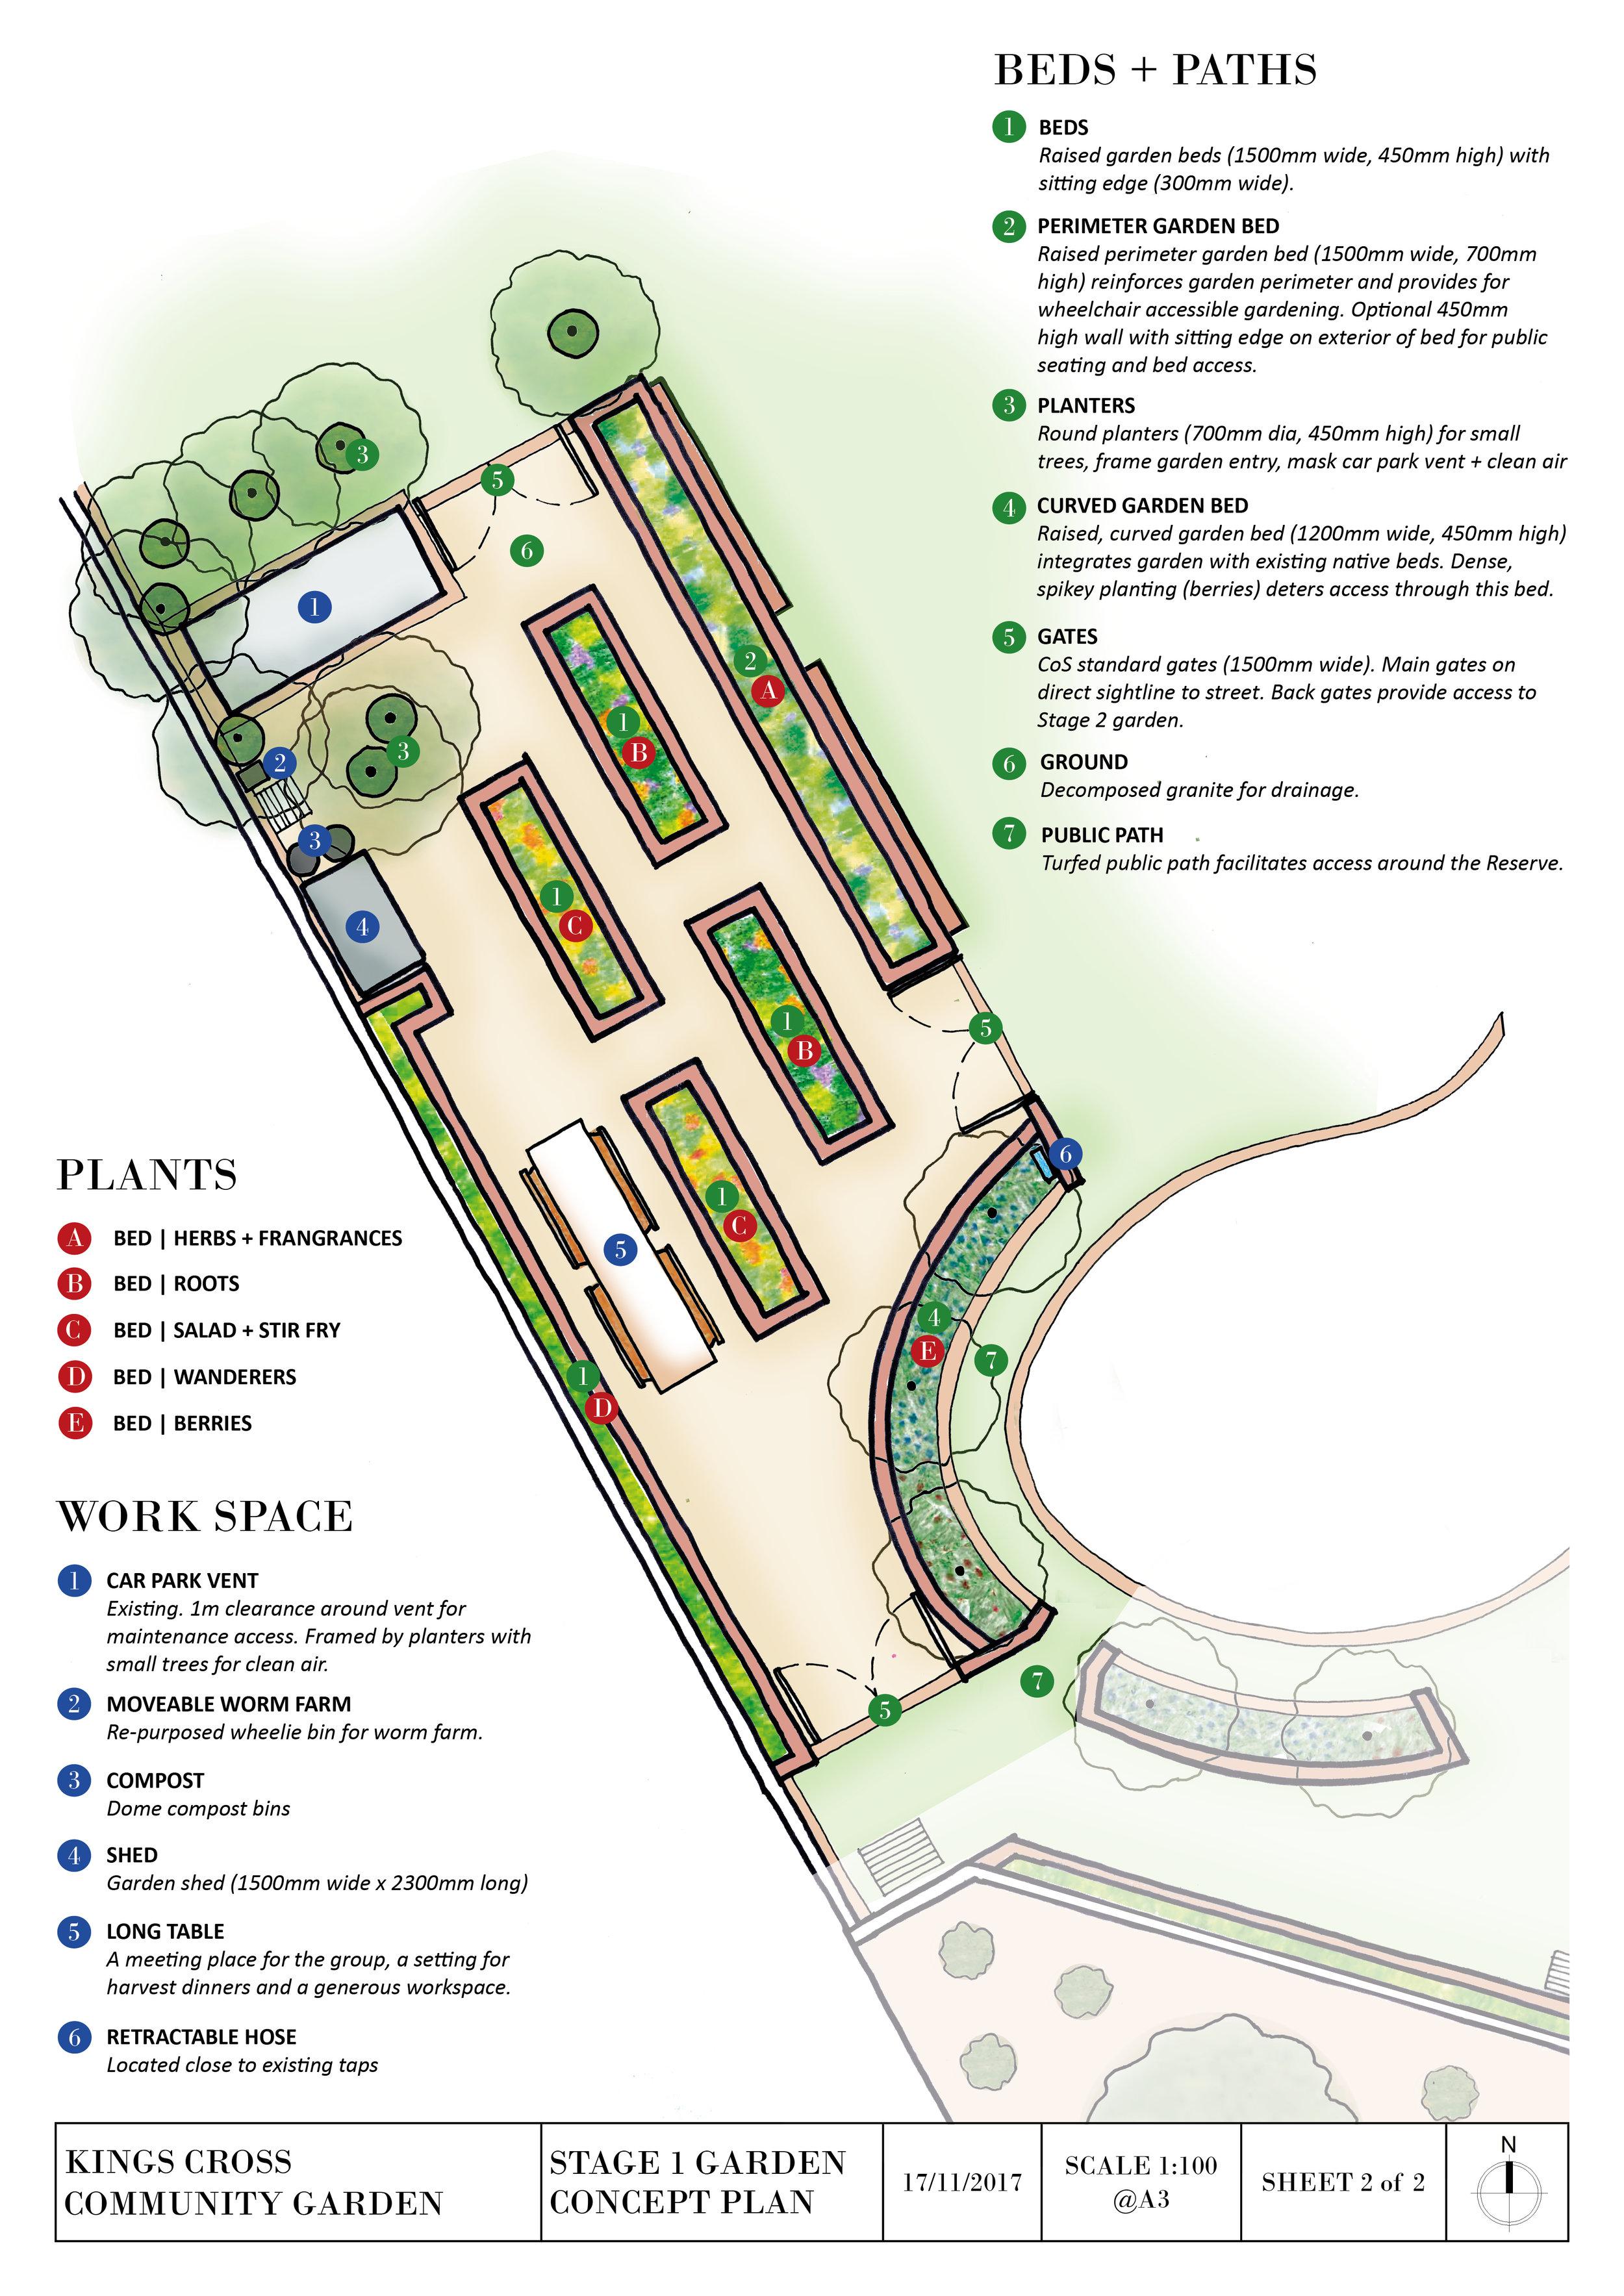 Design Concept_Submission_Stage 1_17 Nov 2017.jpg